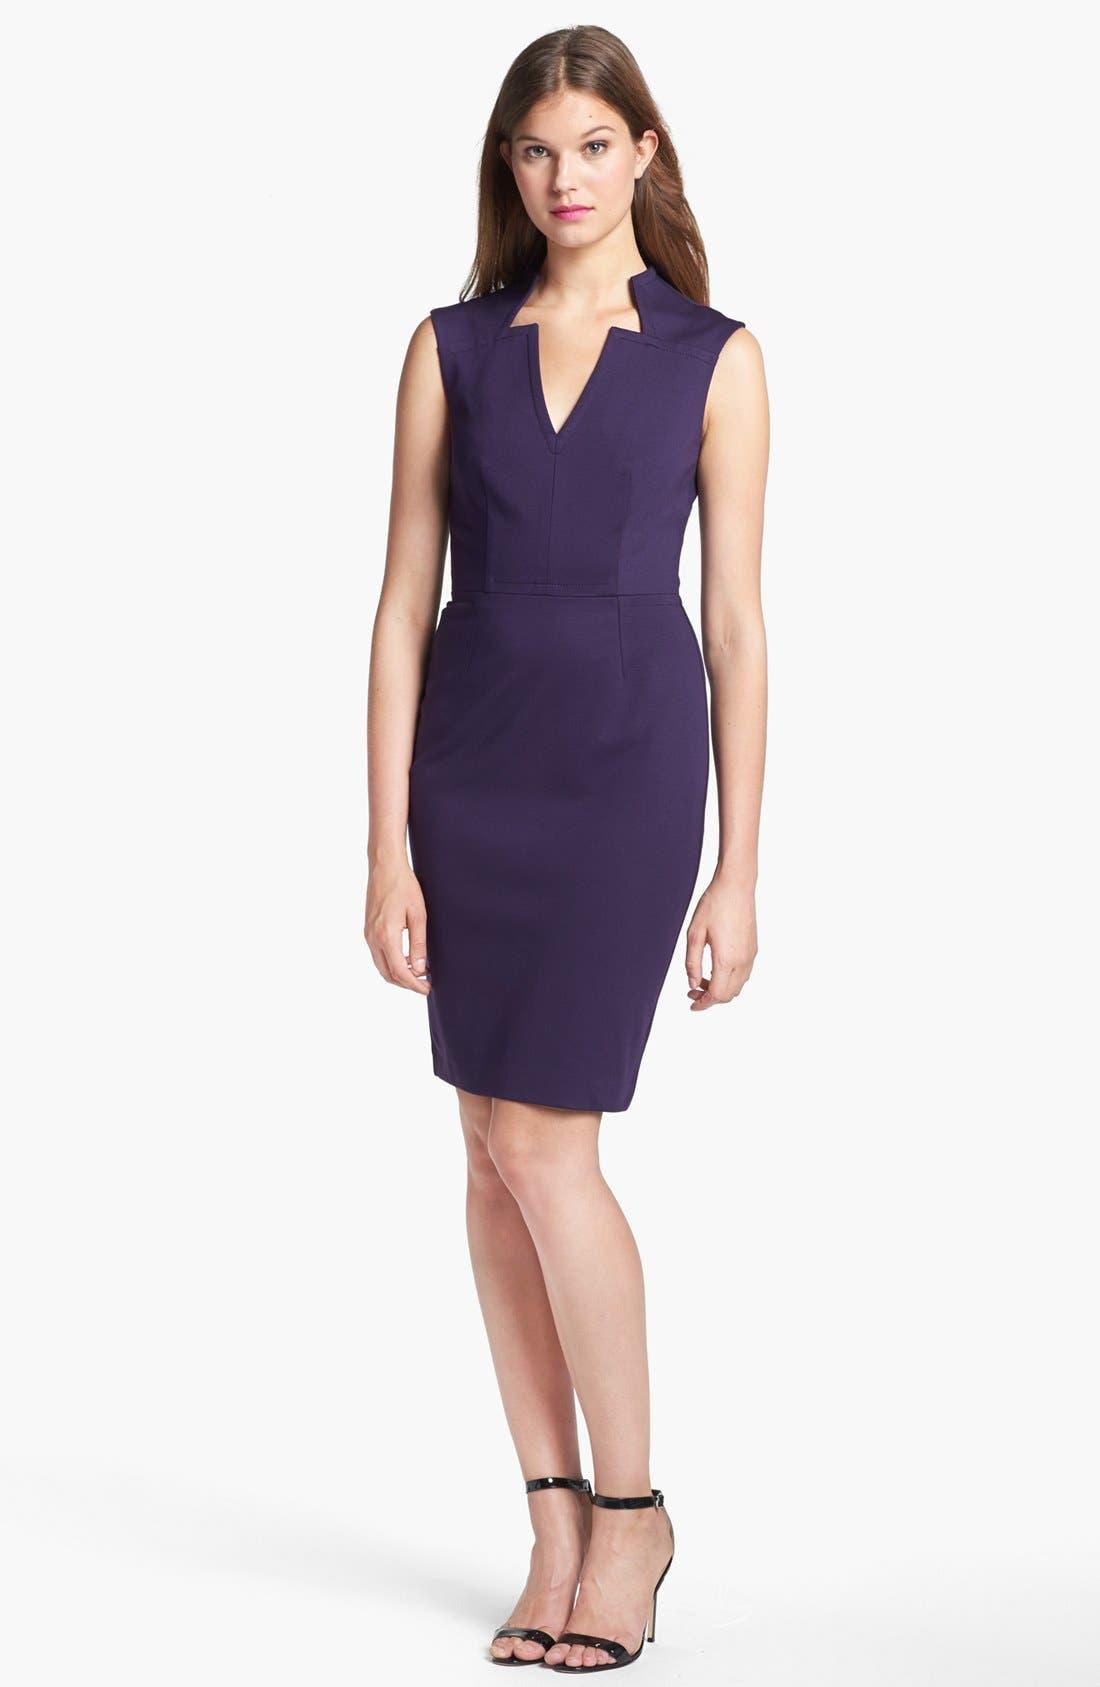 Alternate Image 1 Selected - Trina Turk 'Jubee' Ponte Sheath Dress